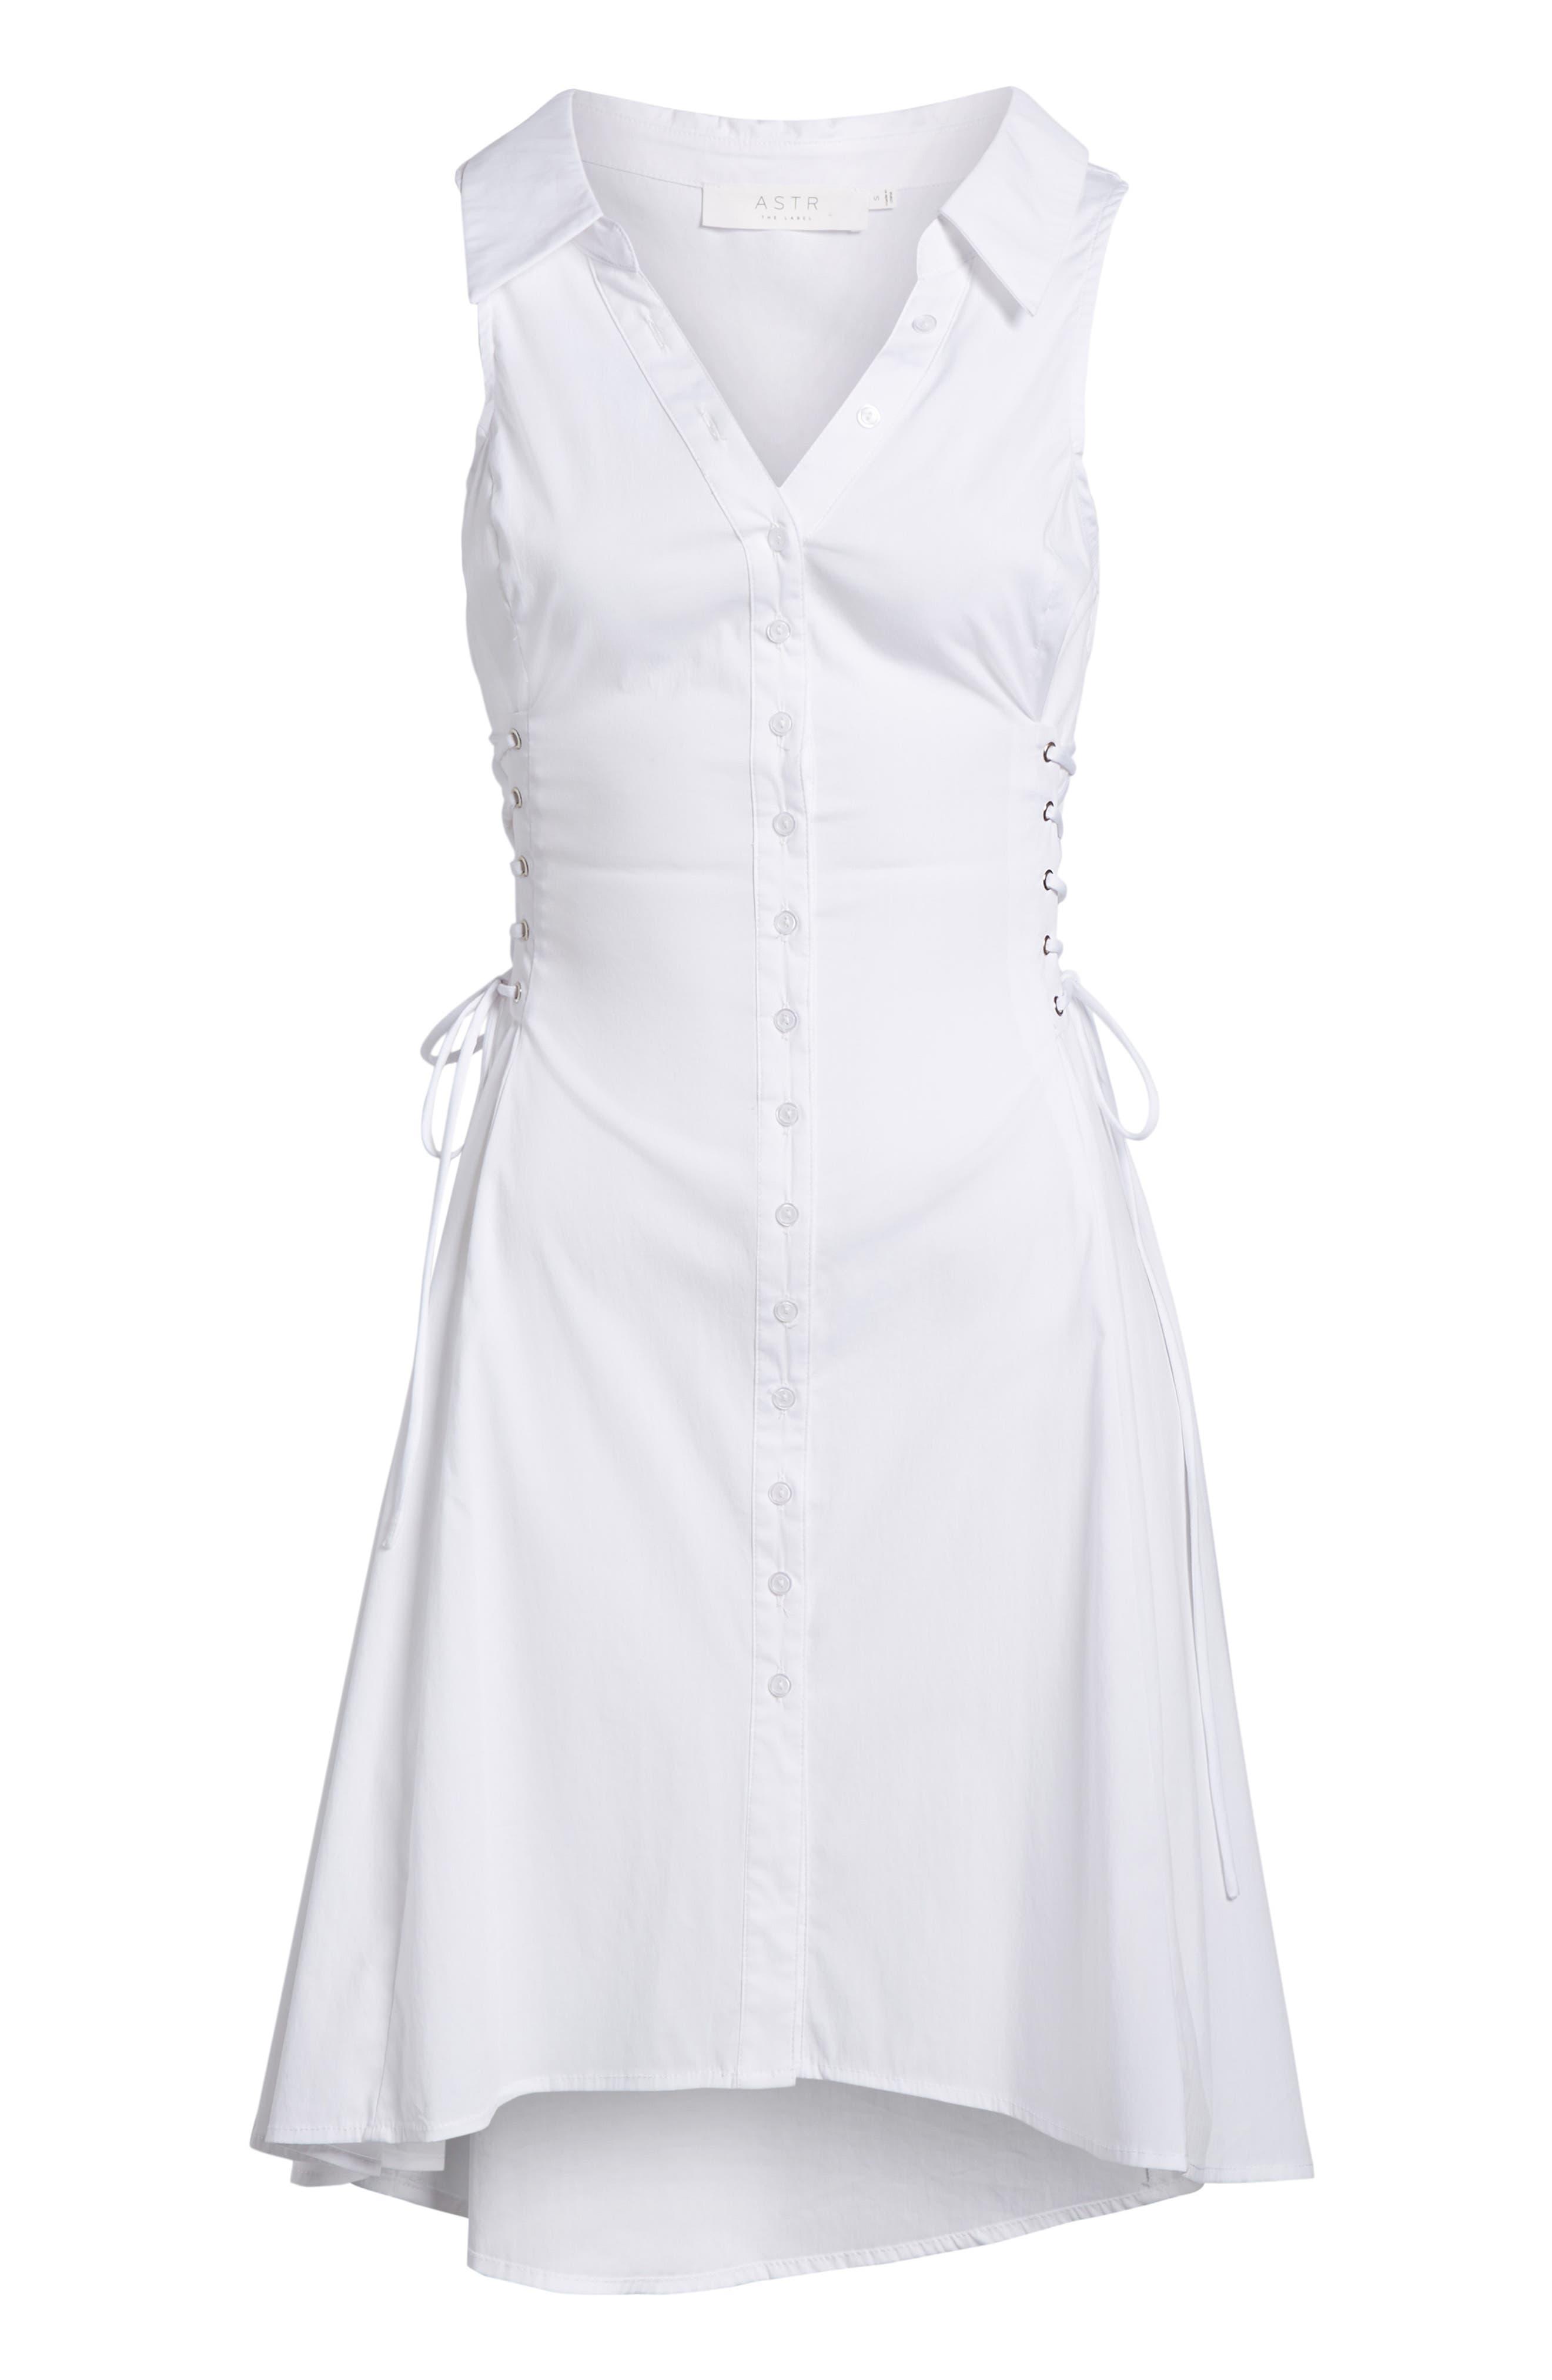 Sydney Lace Side Dress,                             Alternate thumbnail 6, color,